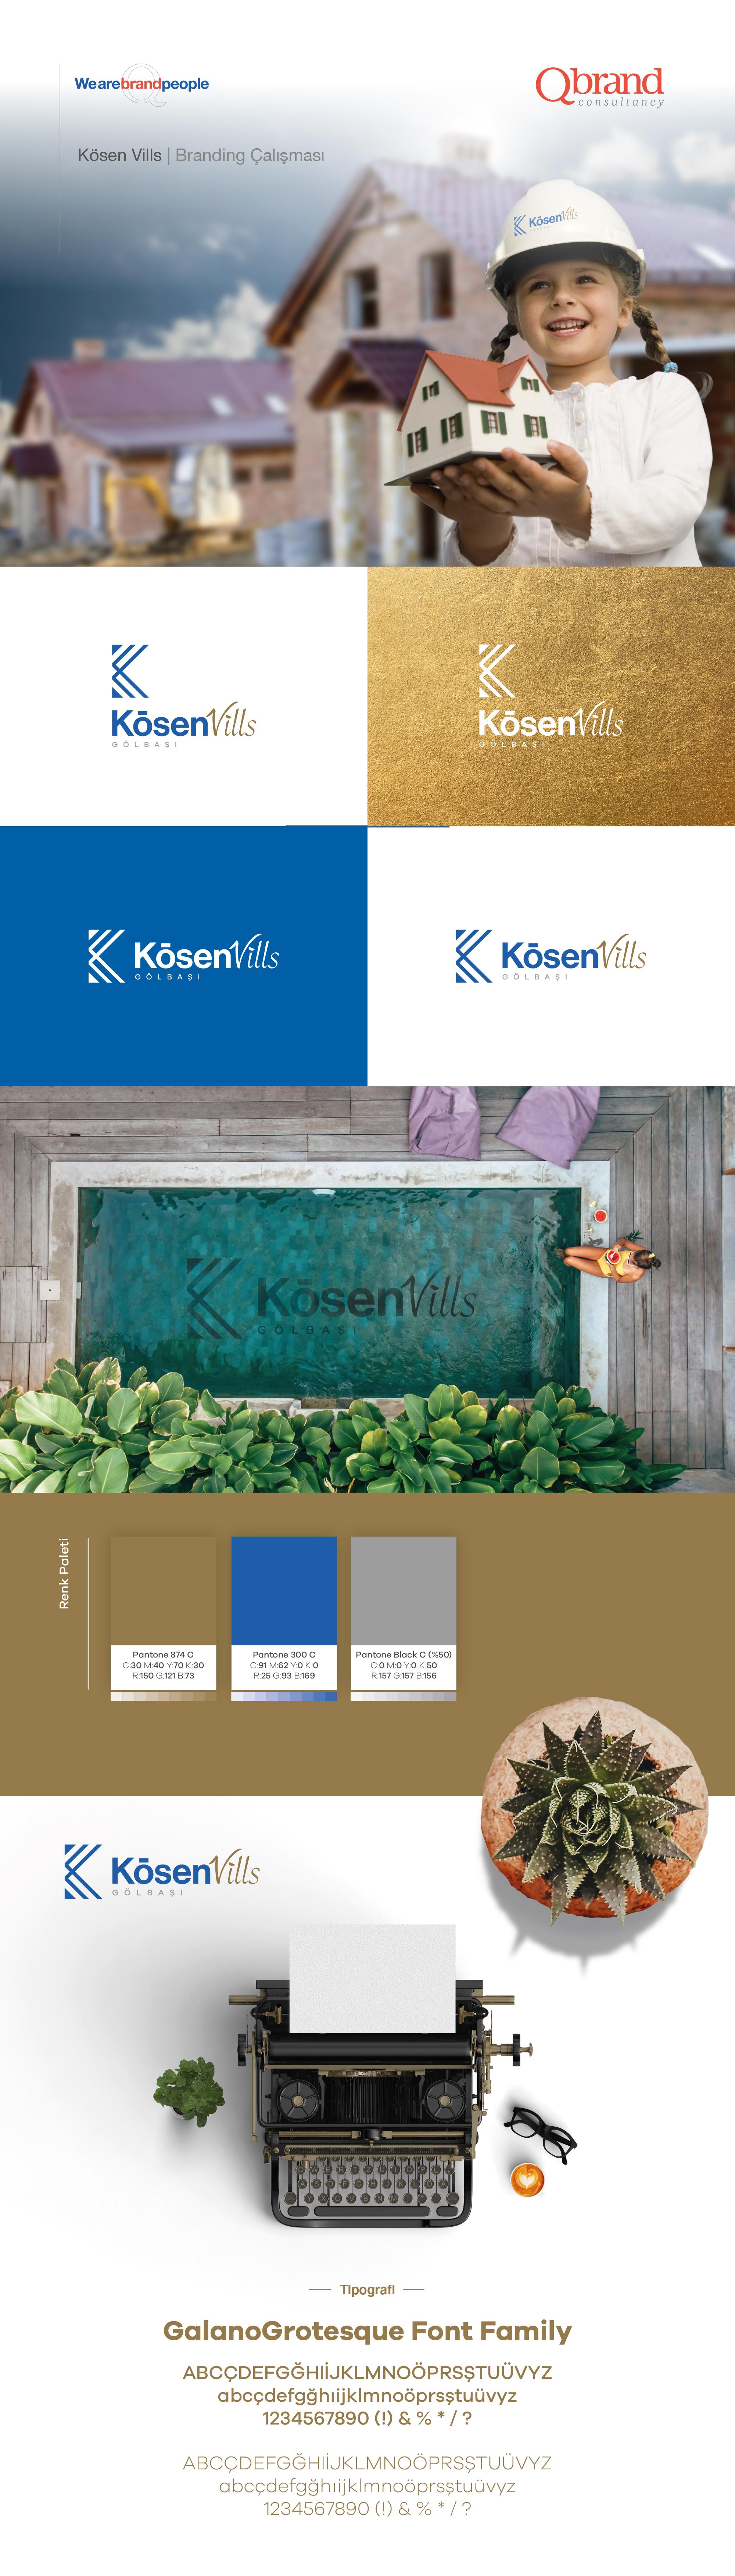 Ankara kurumsal kimlik tasarımı  Kösen Vills